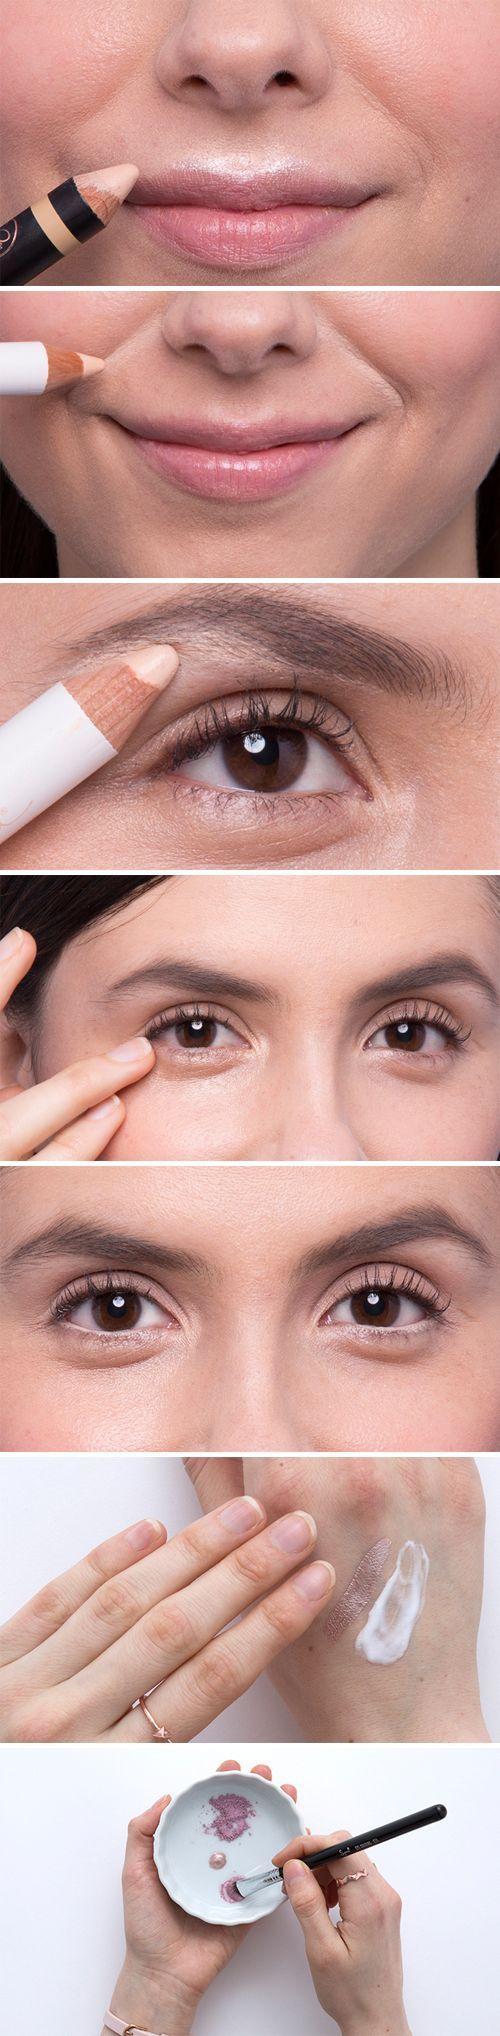 makeup application tips and tricks